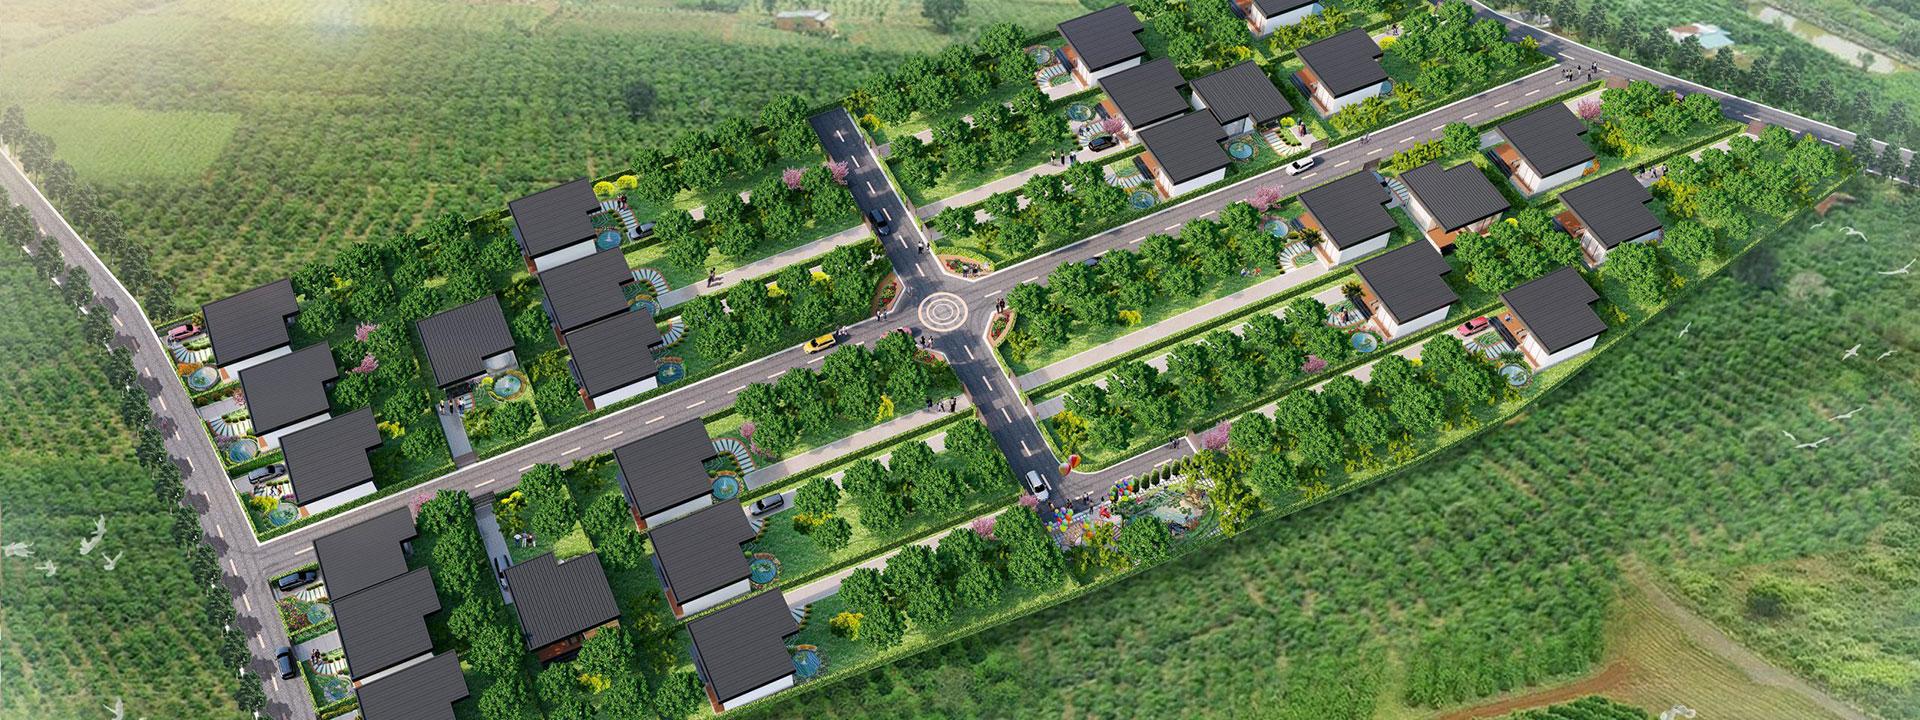 Thiết kế dự án The Green Farmhouse